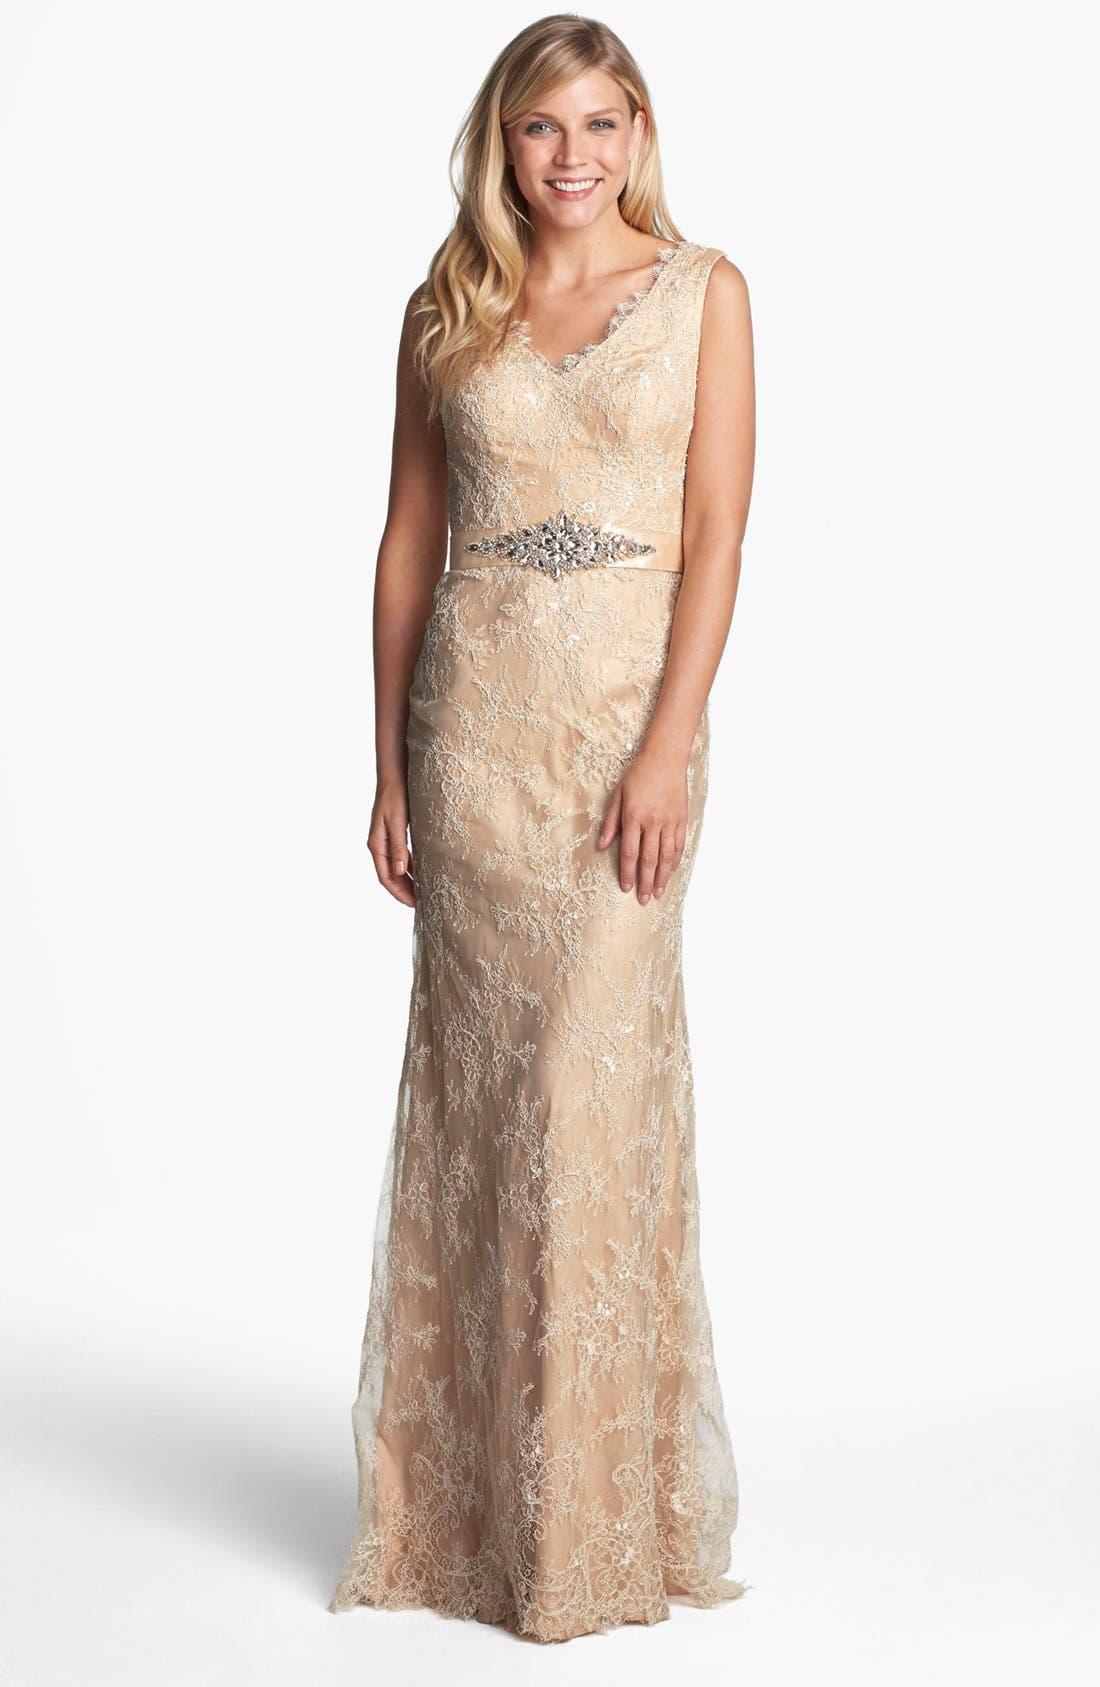 Alternate Image 1 Selected - La Femme Embellished Sleeveless Lace Gown